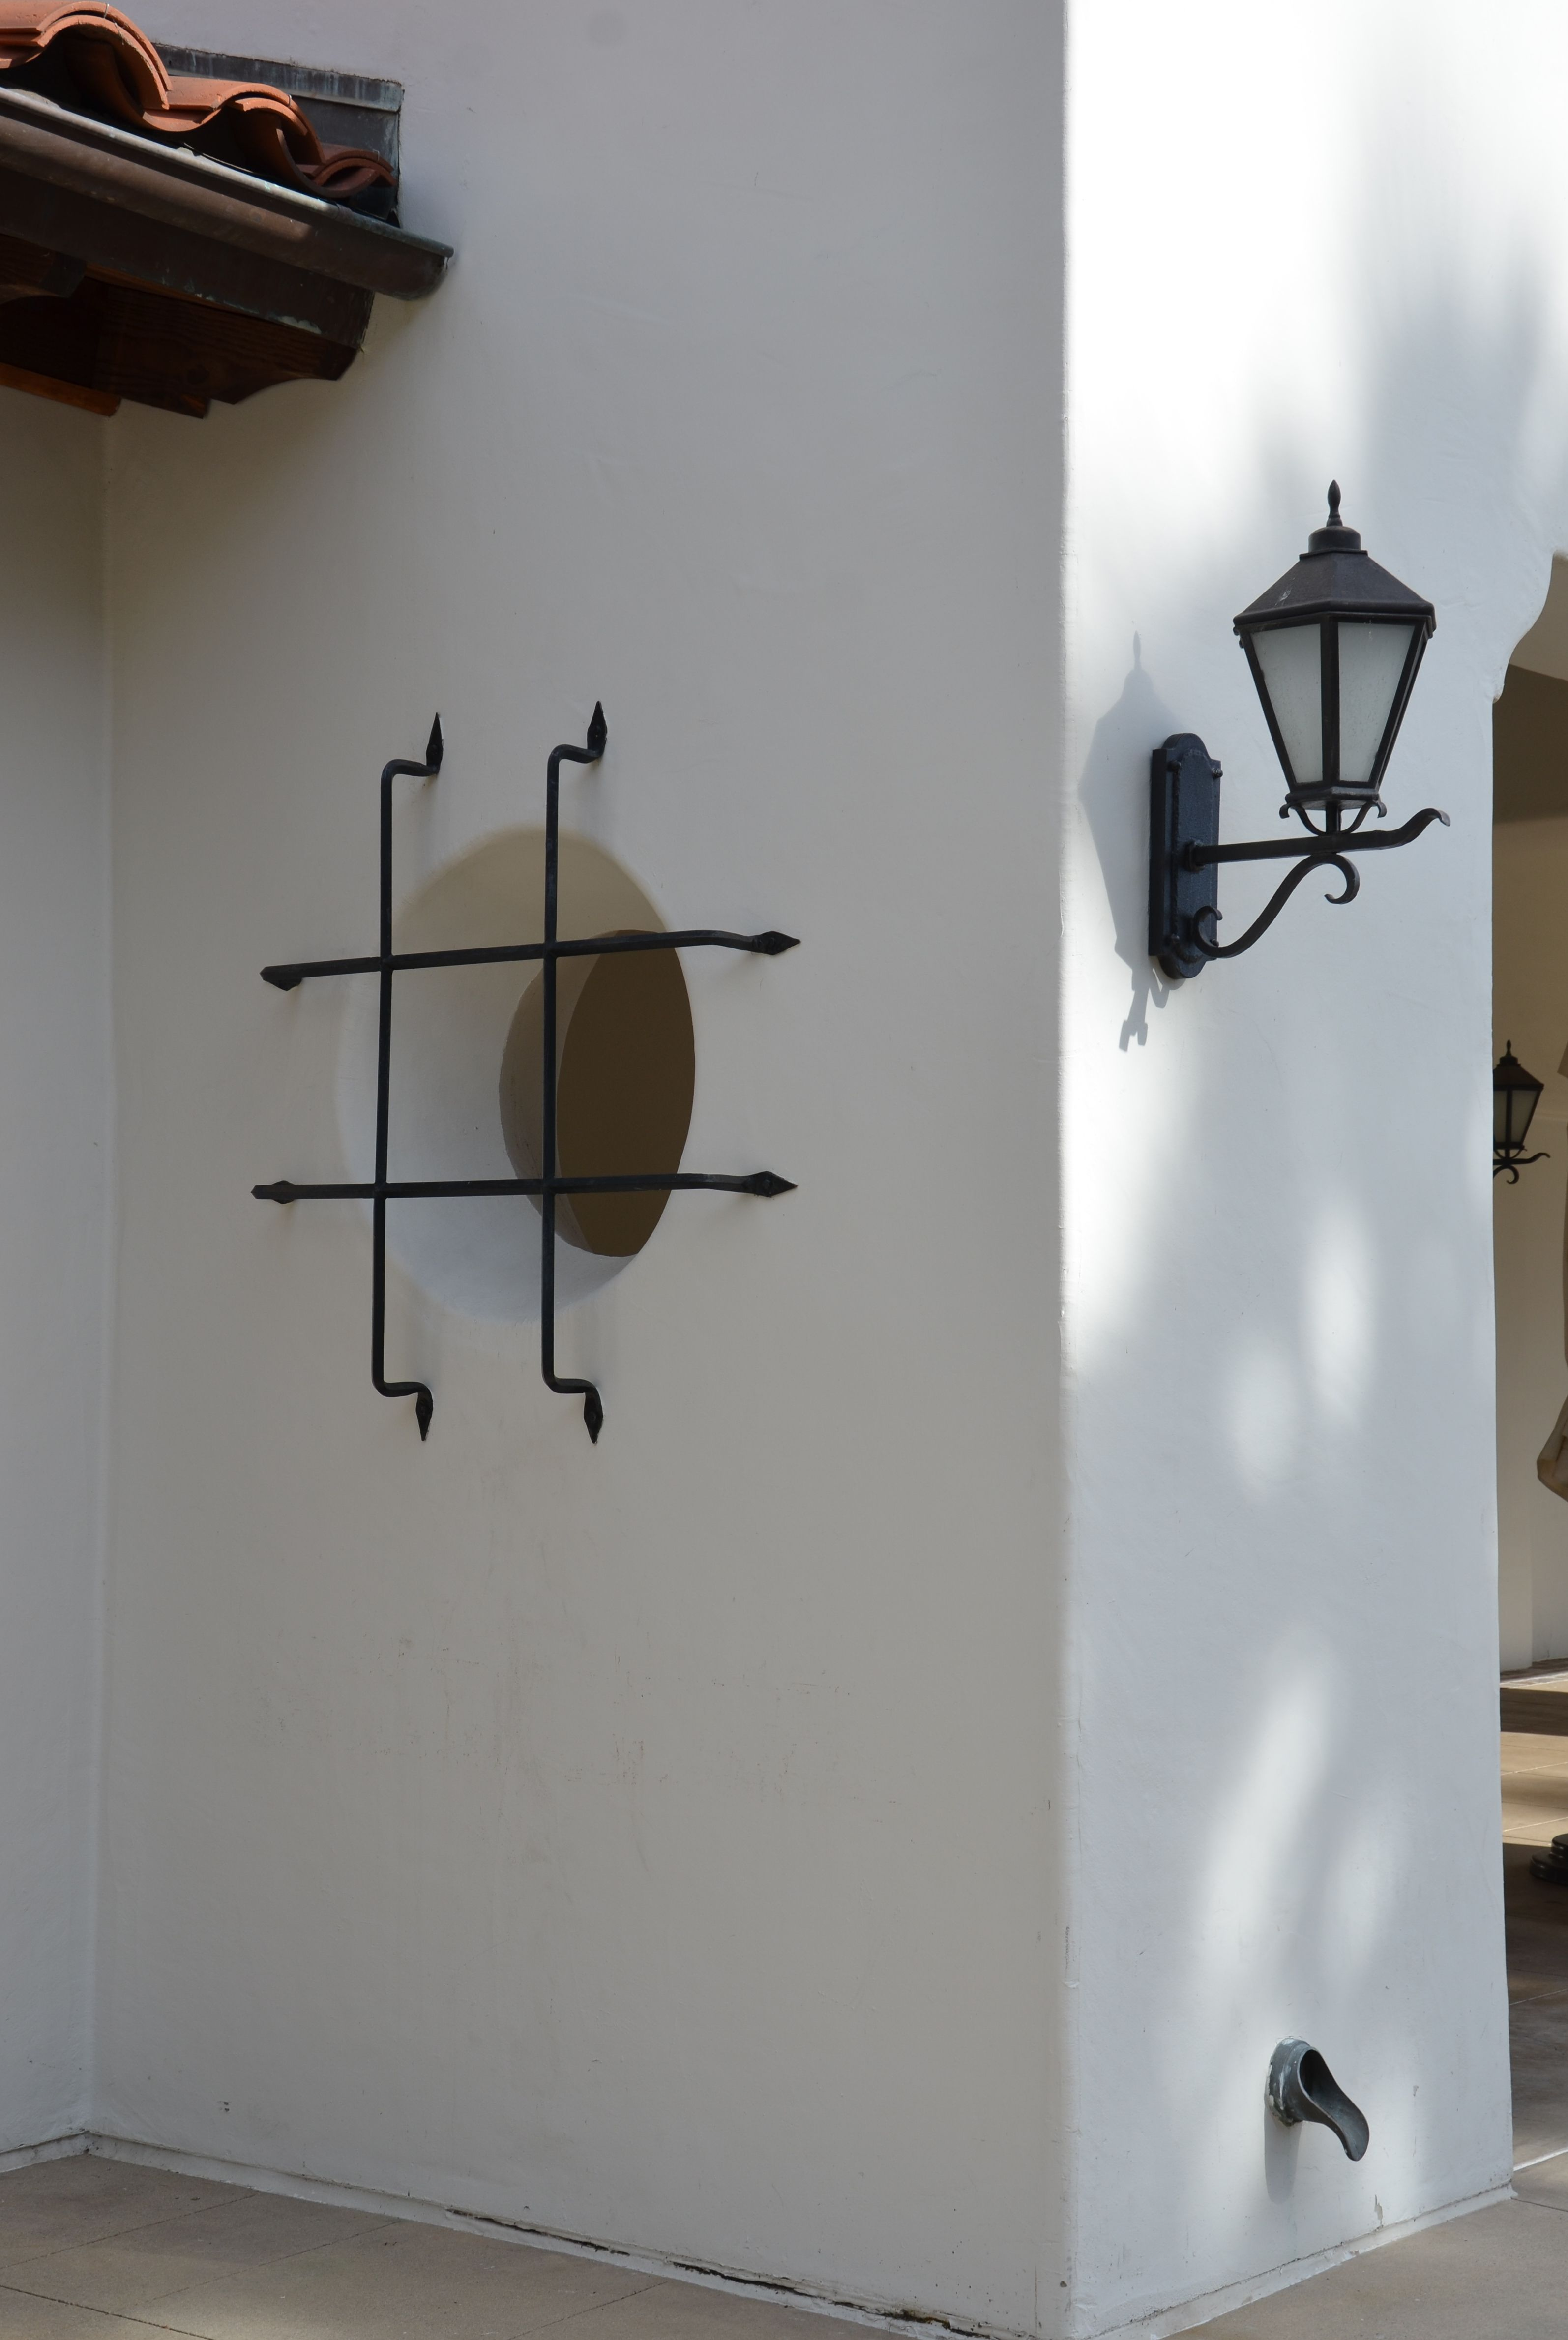 Balcony Window Grill Design: Window - Architectural Details - Bacara Resort